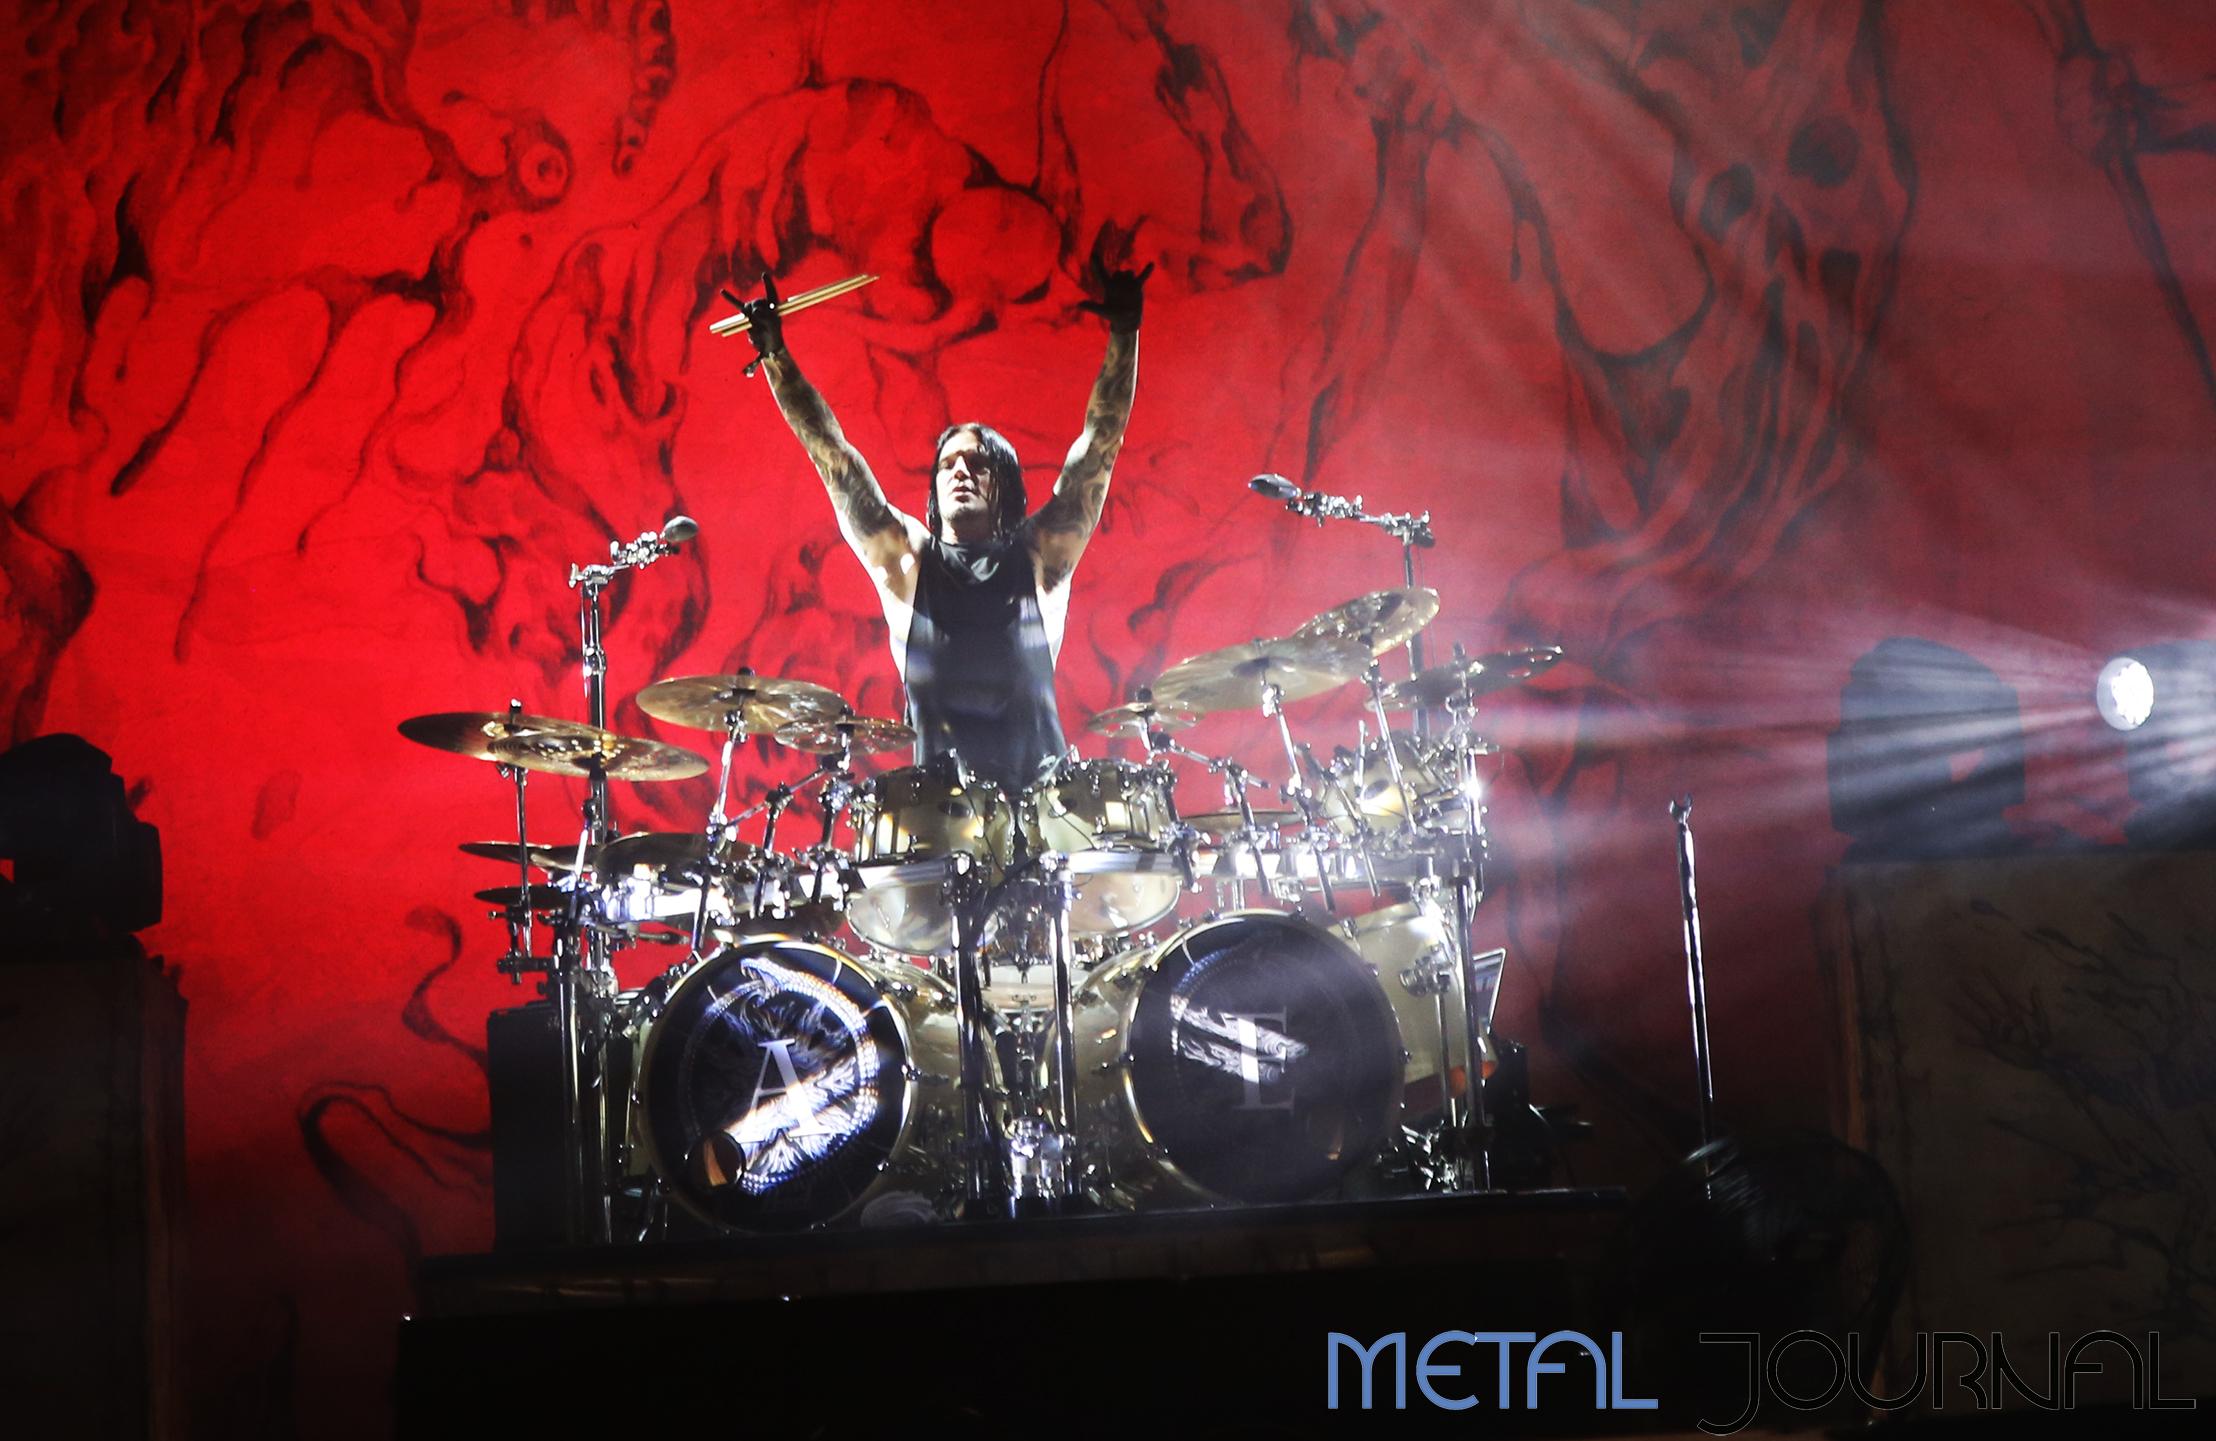 arch enemy - metal journal rock fest barcelona 2019 pic 5